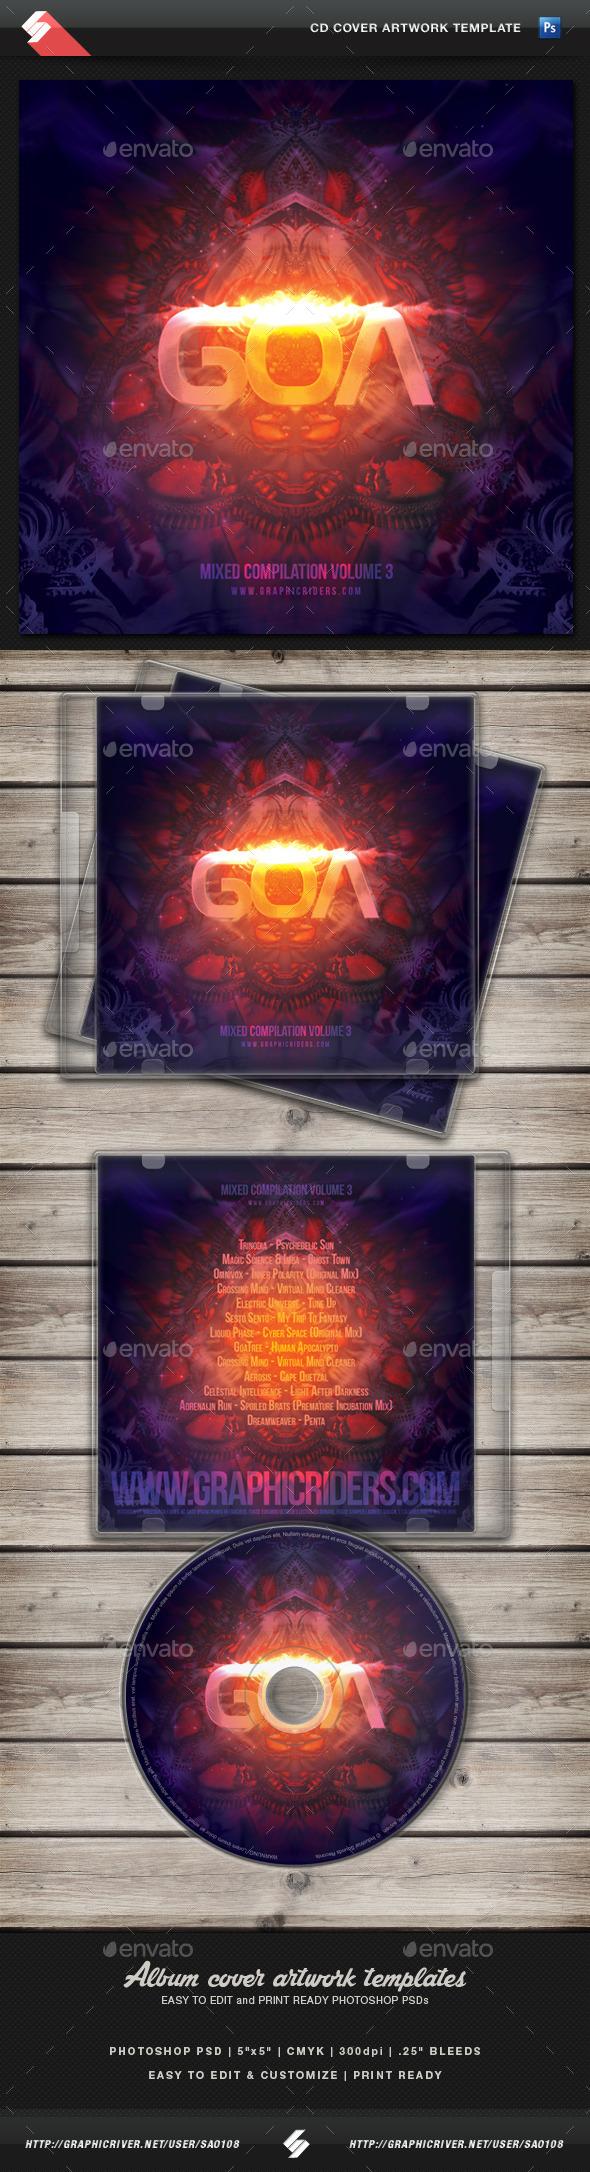 Goa Trance volume 3 CD Cover Artwork Template